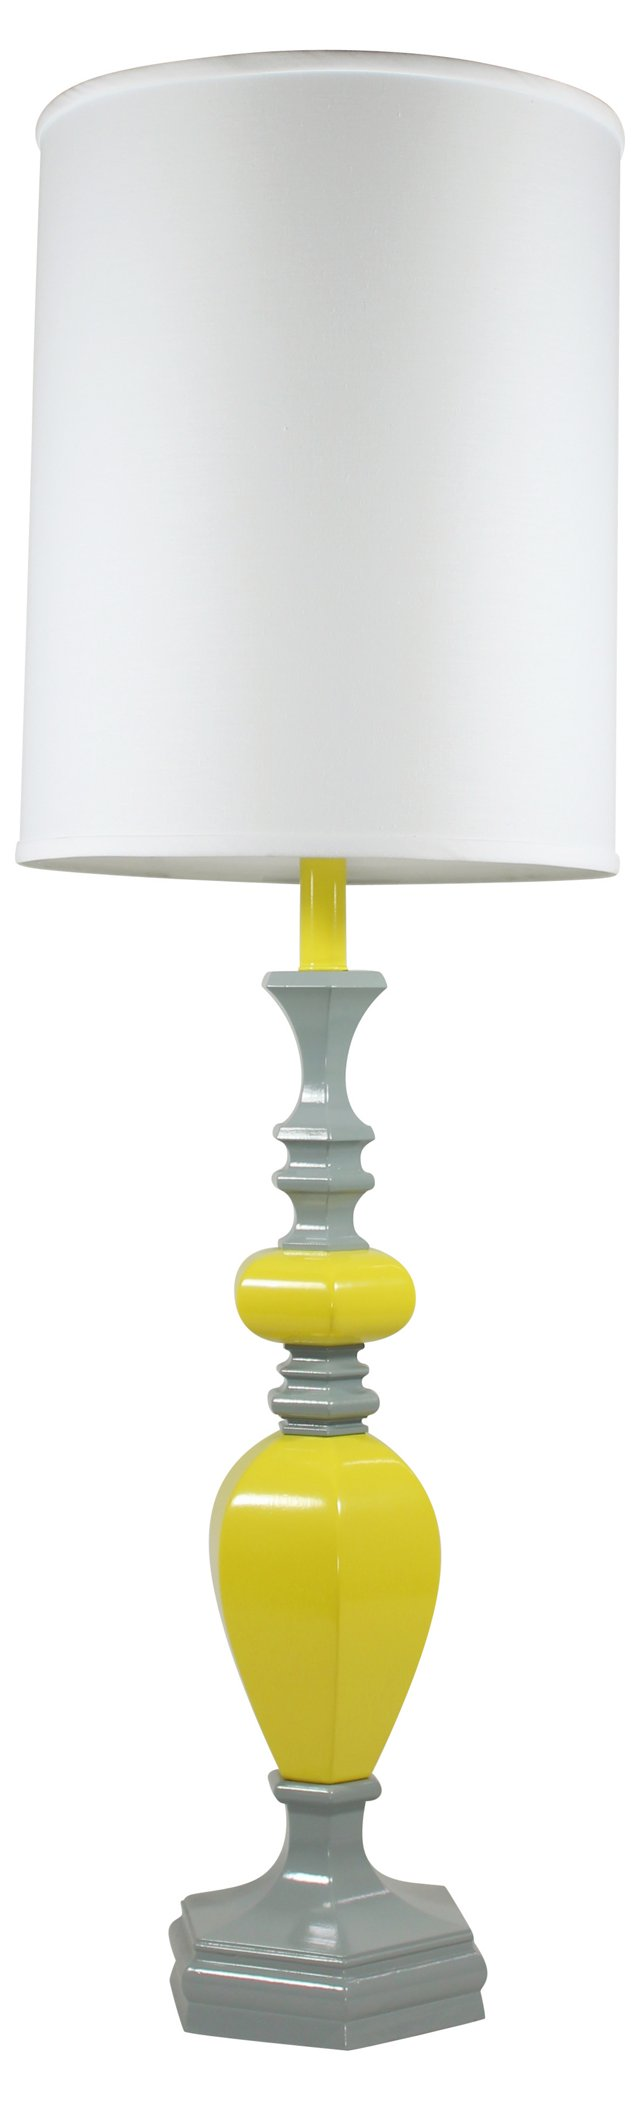 Yellow & Gray Stacked Lamp Base